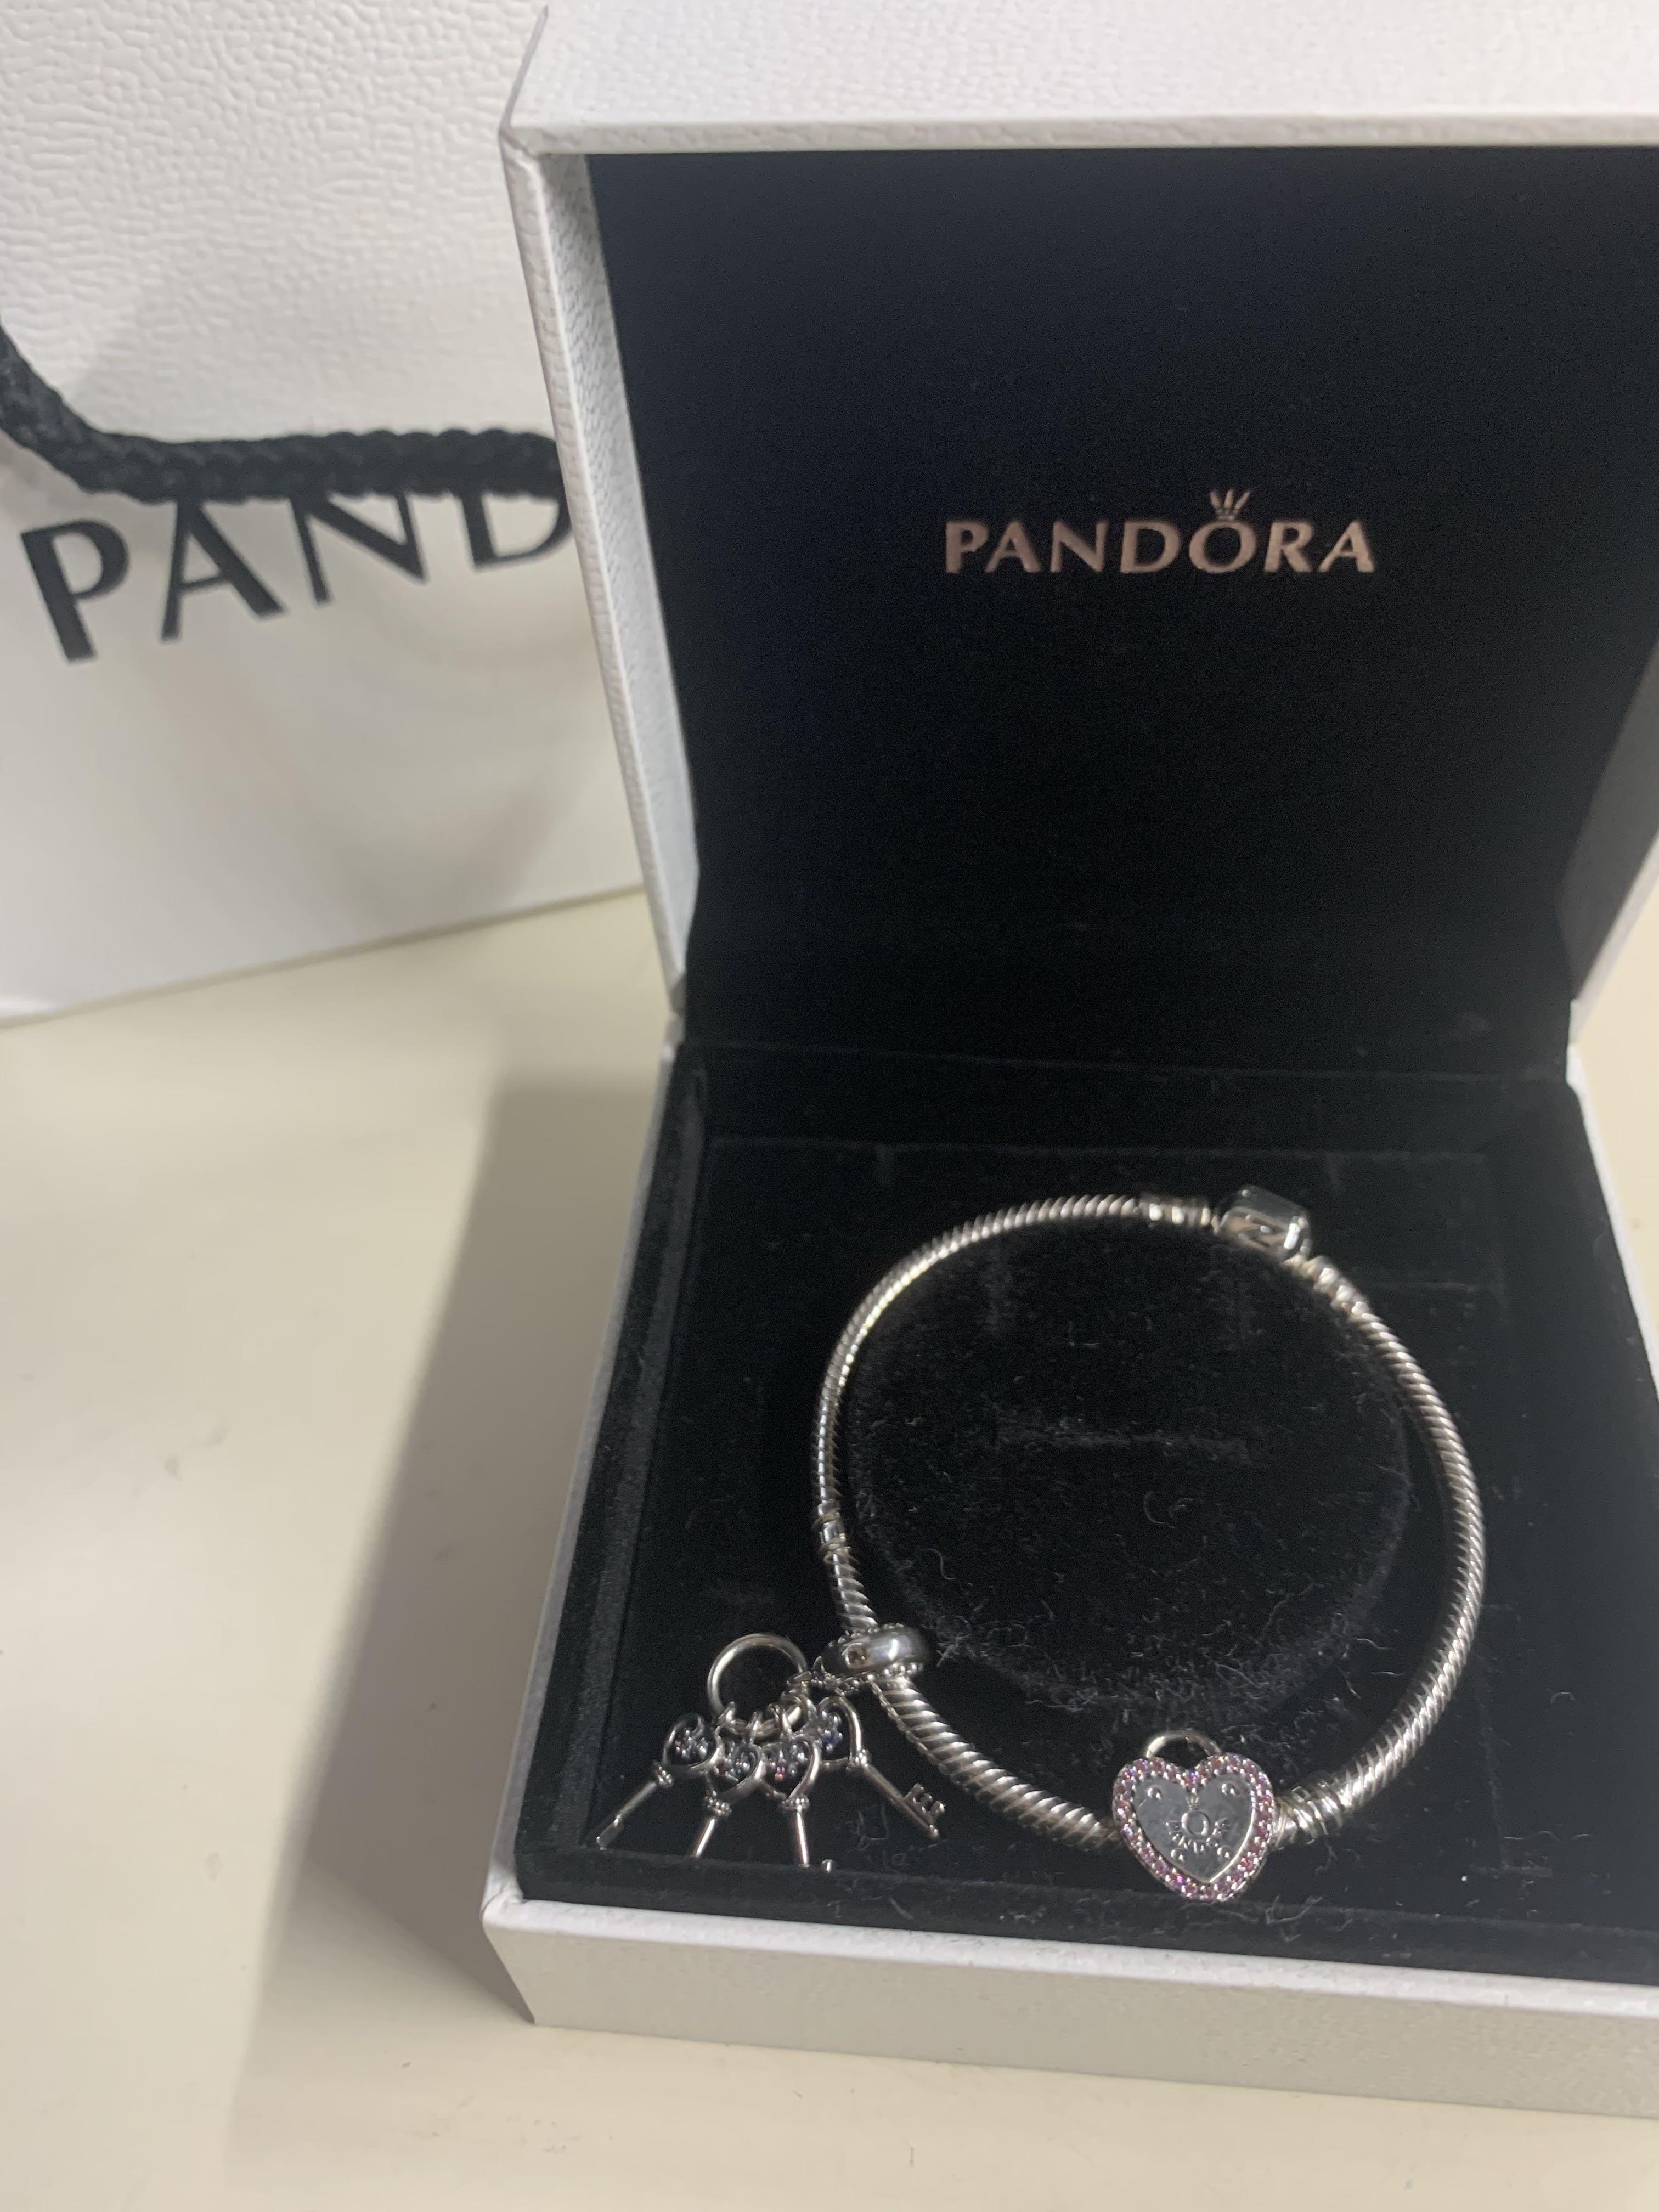 Pandora Bracelet Valentine S Heart Lock Women S Fashion Jewelry Organisers Bracelets On Carousell